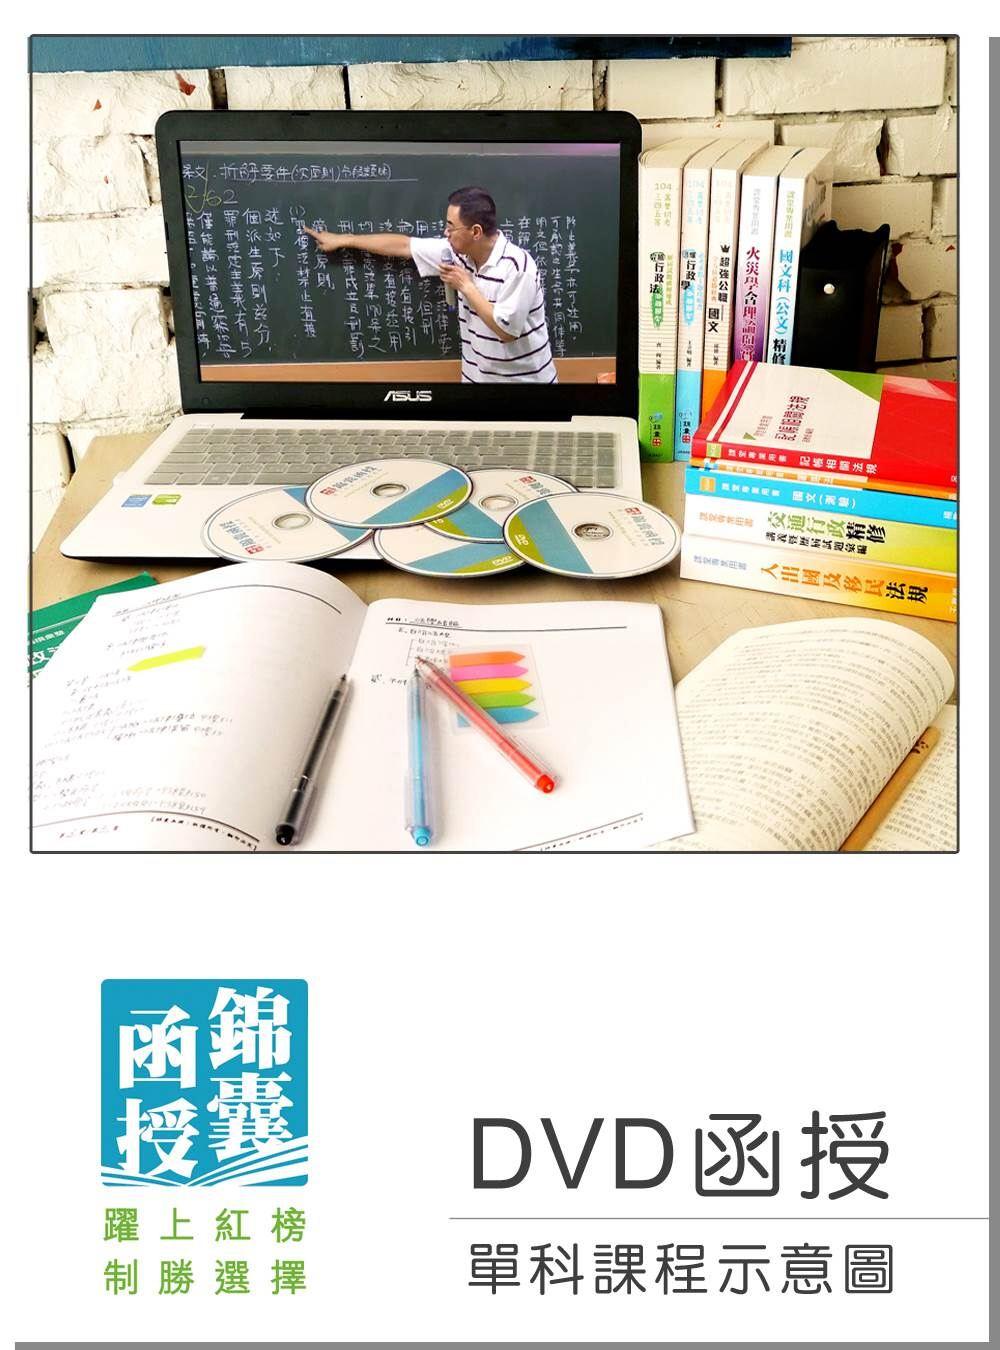 【DVD函授】中外歷史:單科課程(106版)